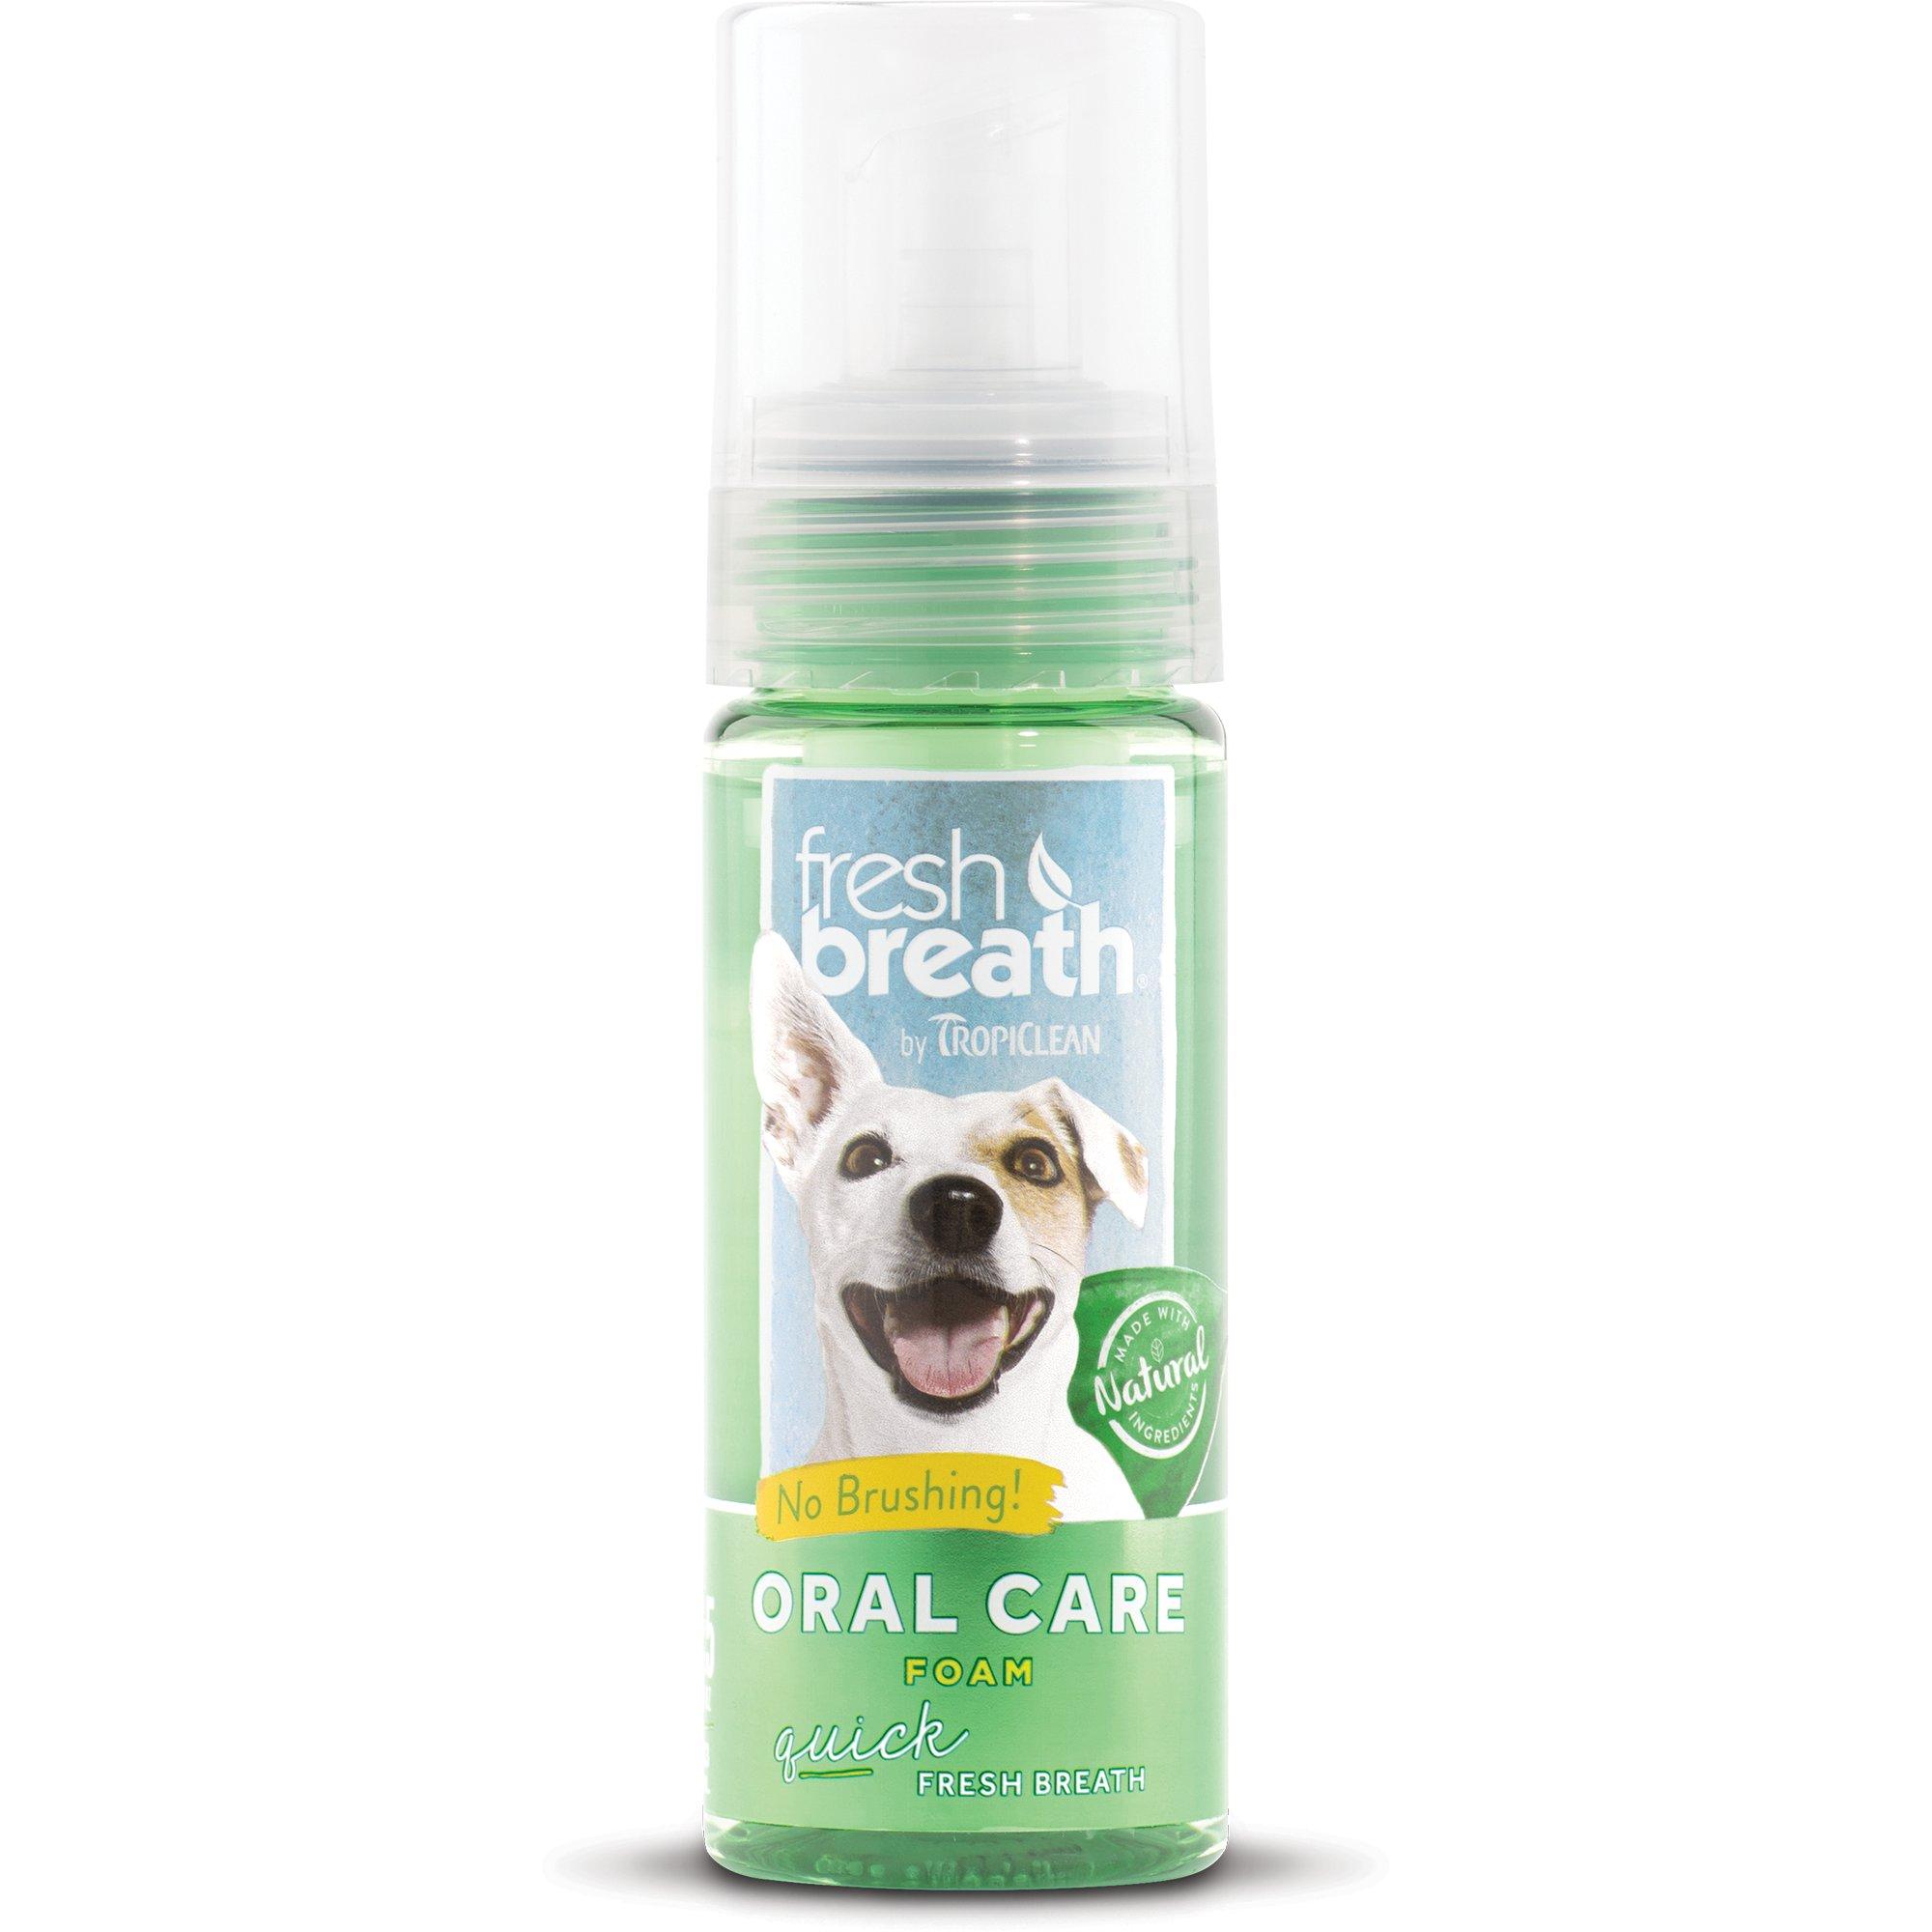 TropiClean Fresh Breath Fresh Mint Foam Dental Wash & Freshener for Pets